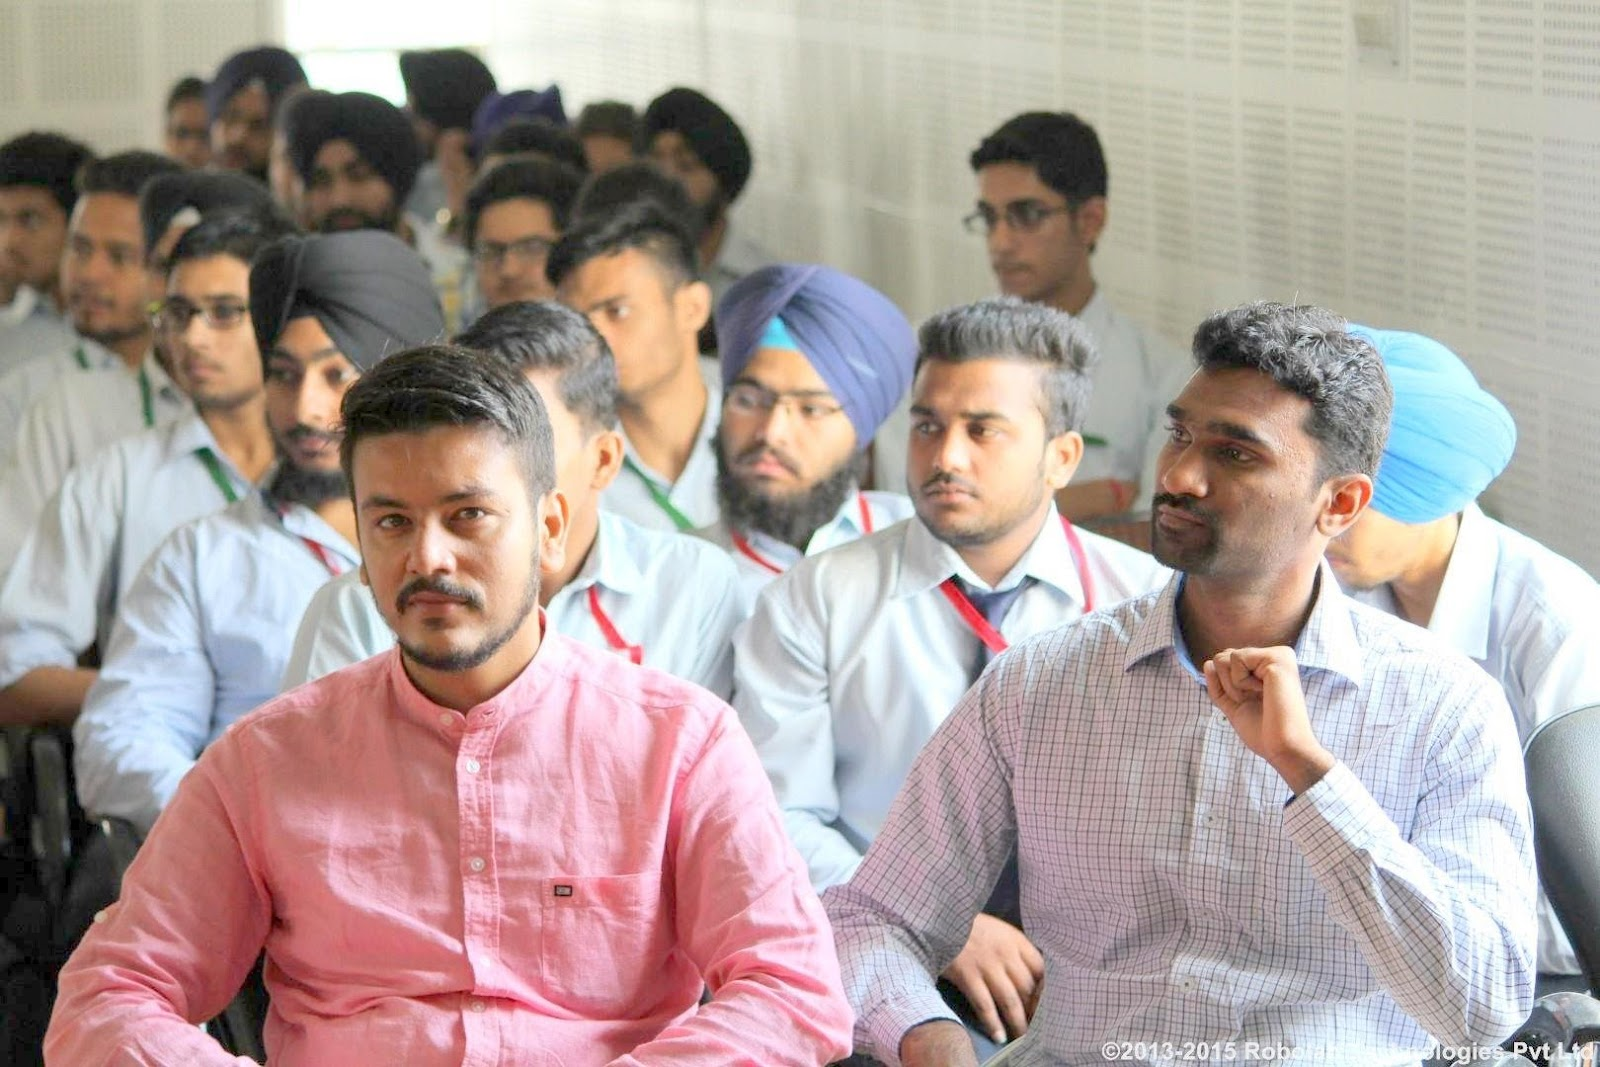 Amritsar College Of Engineering and Technology, Amritsar Robolab 15 (4).jpg